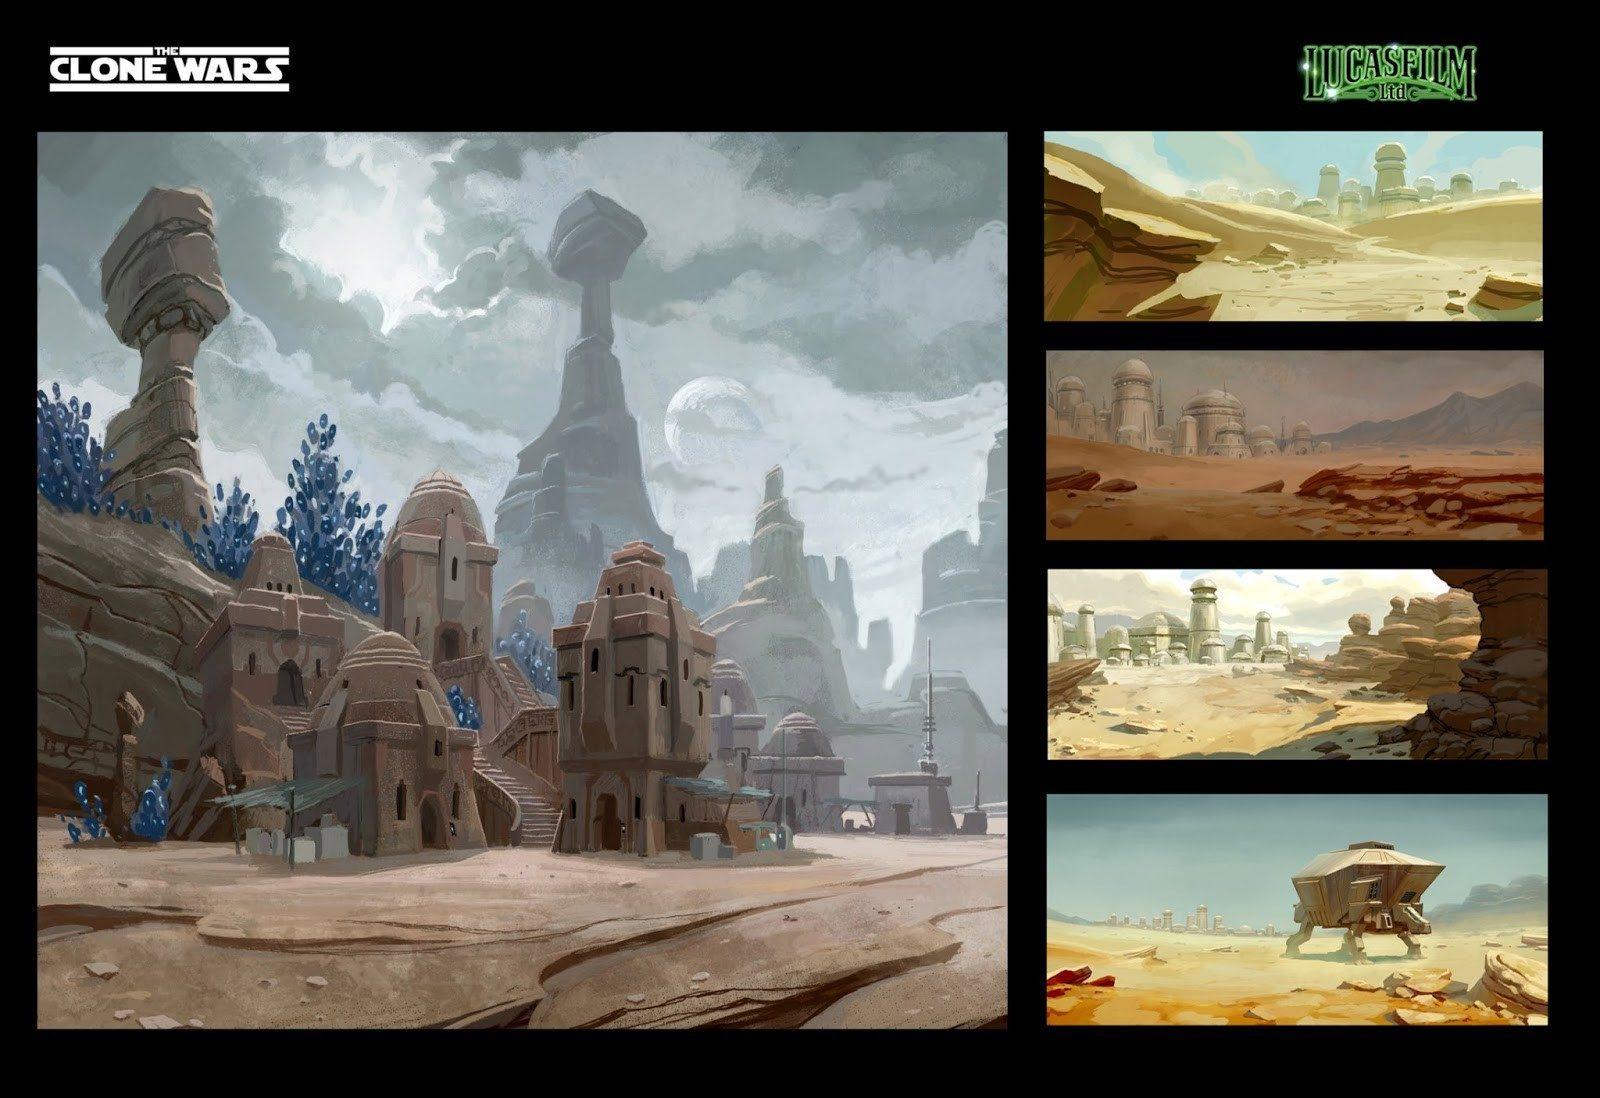 Star Wars The Clone Wars Concept Art